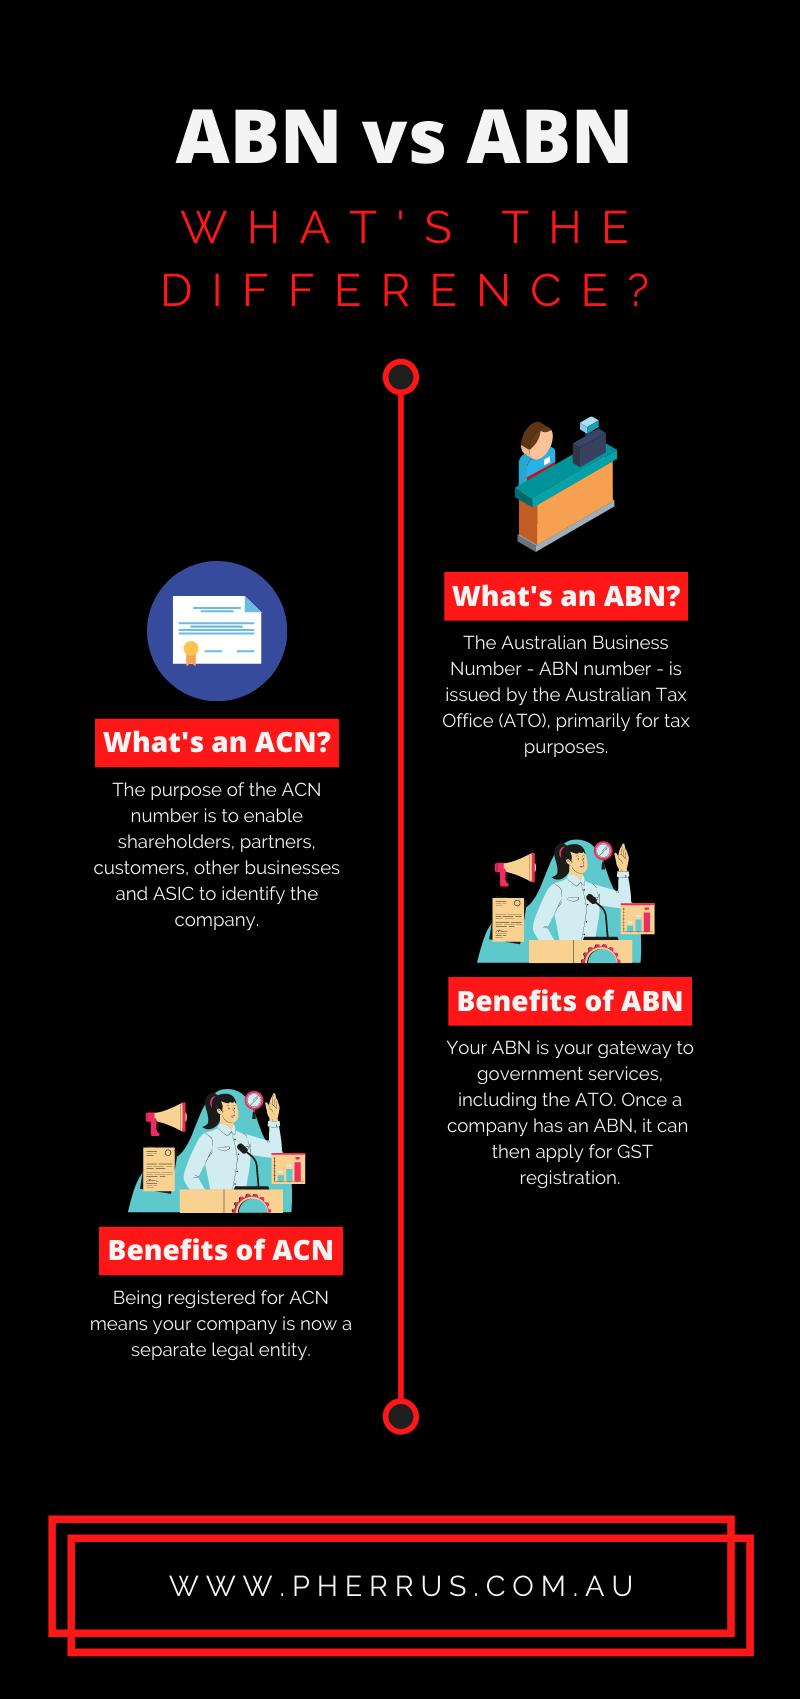 ABN vs ACN Infographic